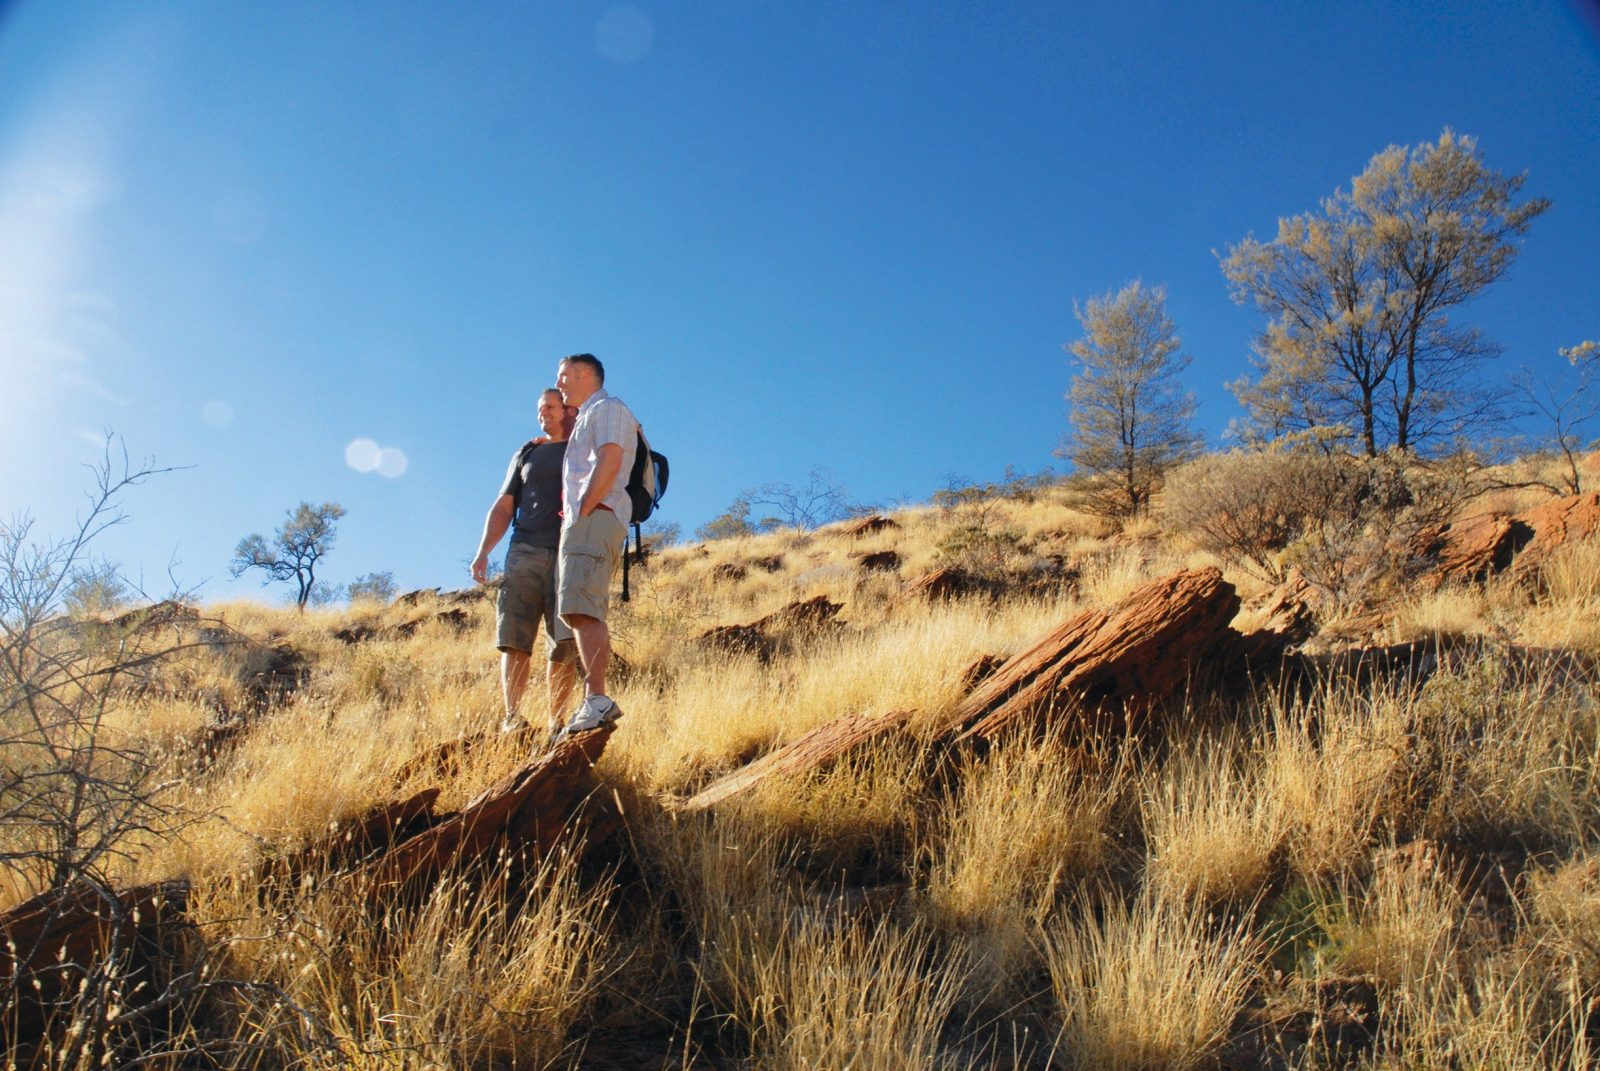 Larapinta Trail, Alice Springs Area, Northern Territory, Australia